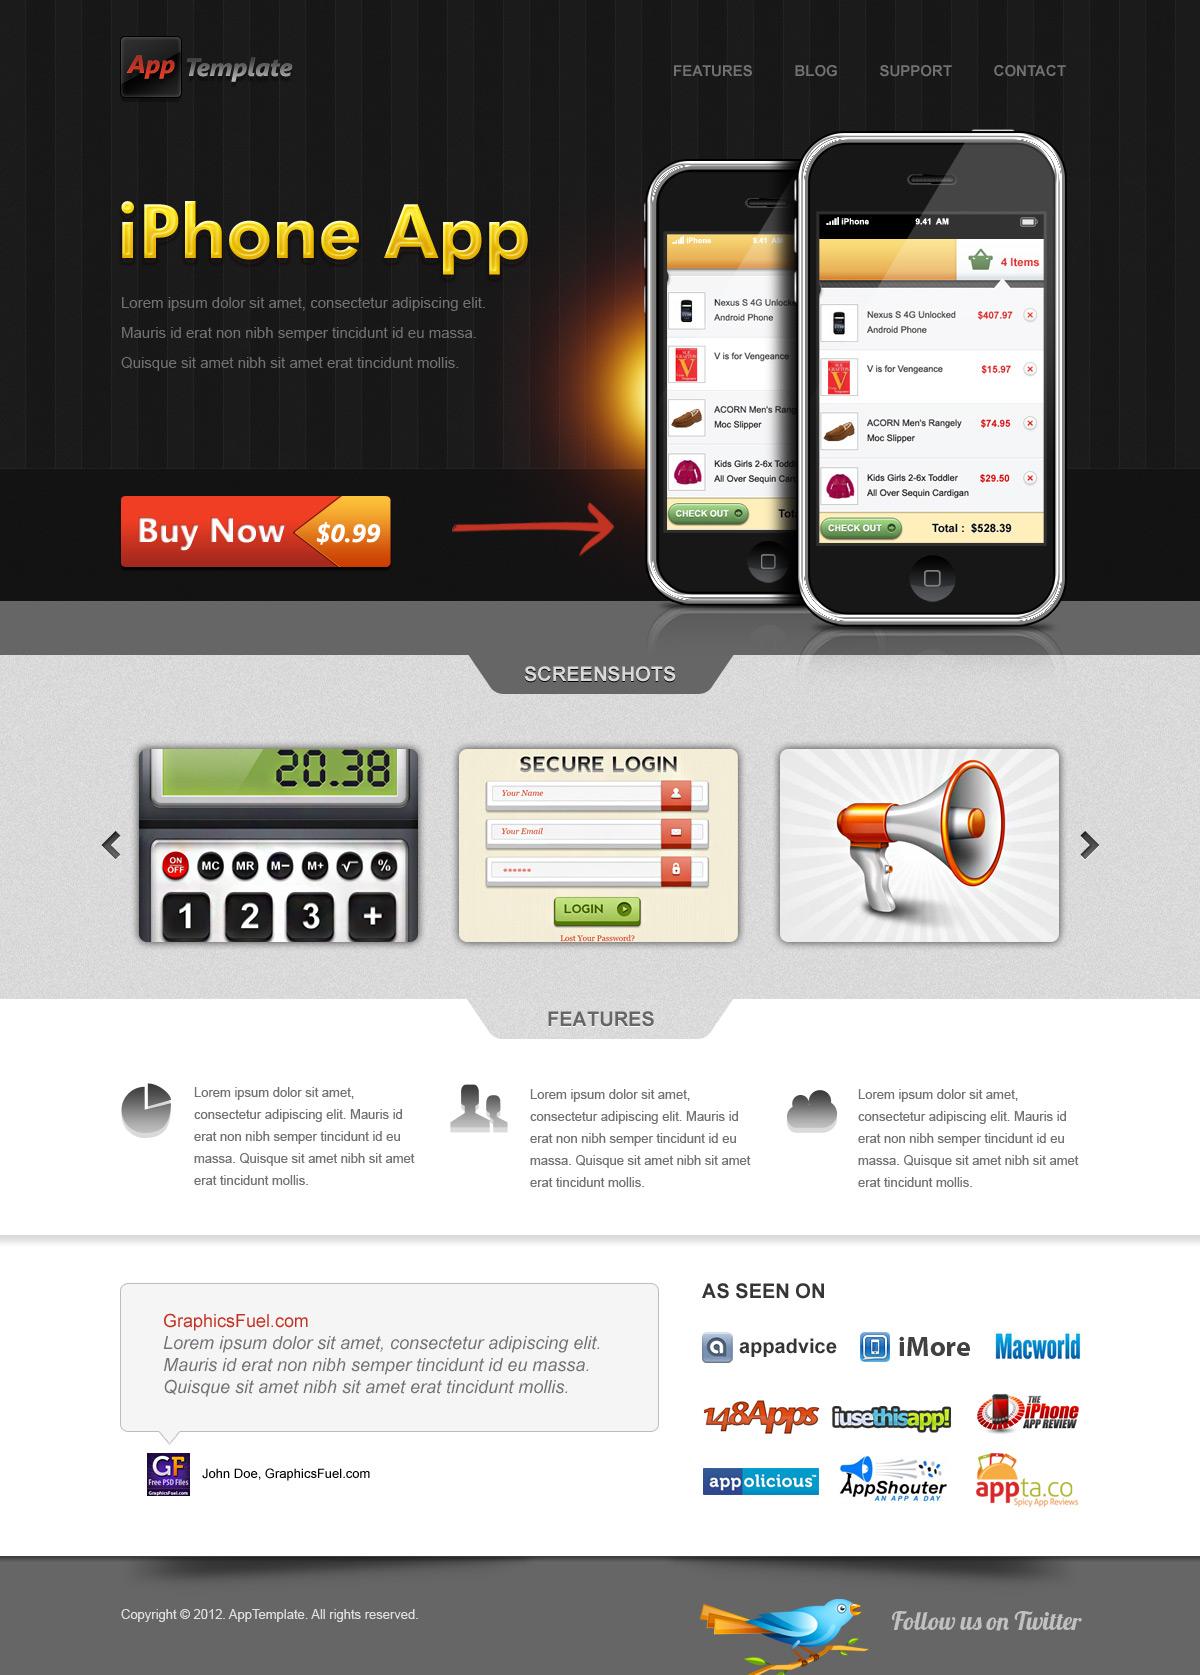 iphone app website template free